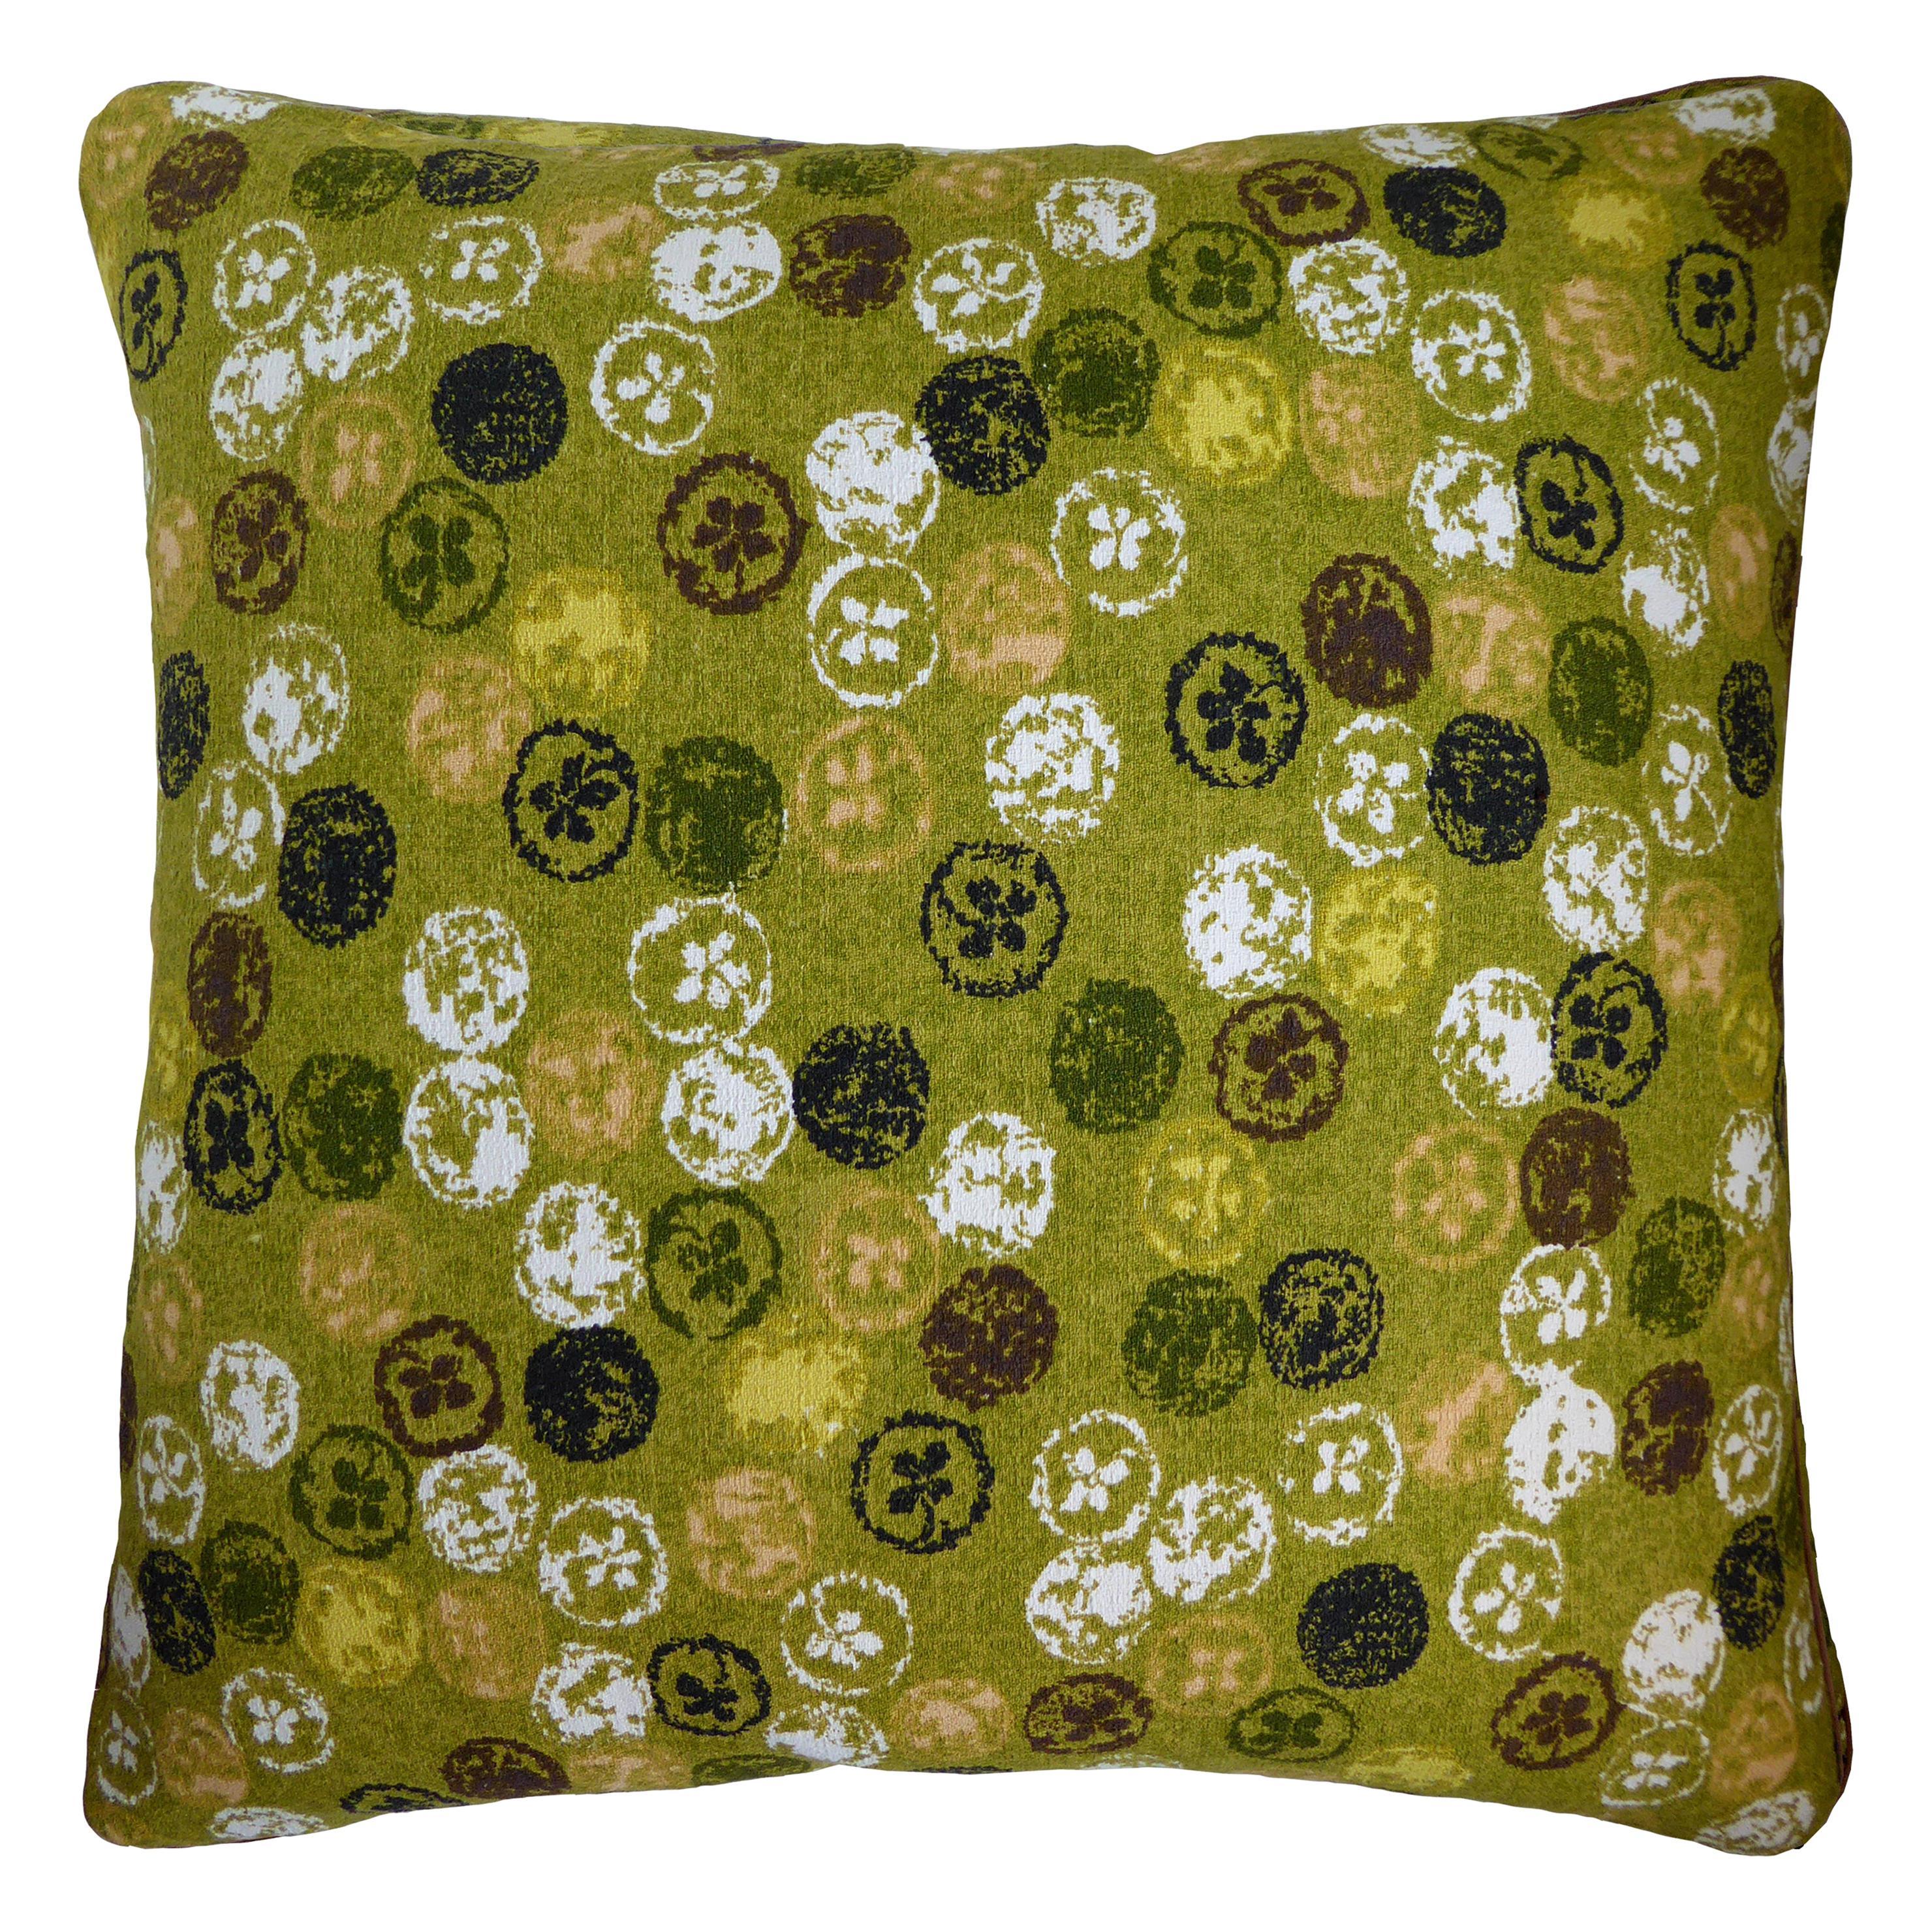 Vintage Cushions Luxury Bespoke Made Pillow 'Monoprinty Lemons' Made in London